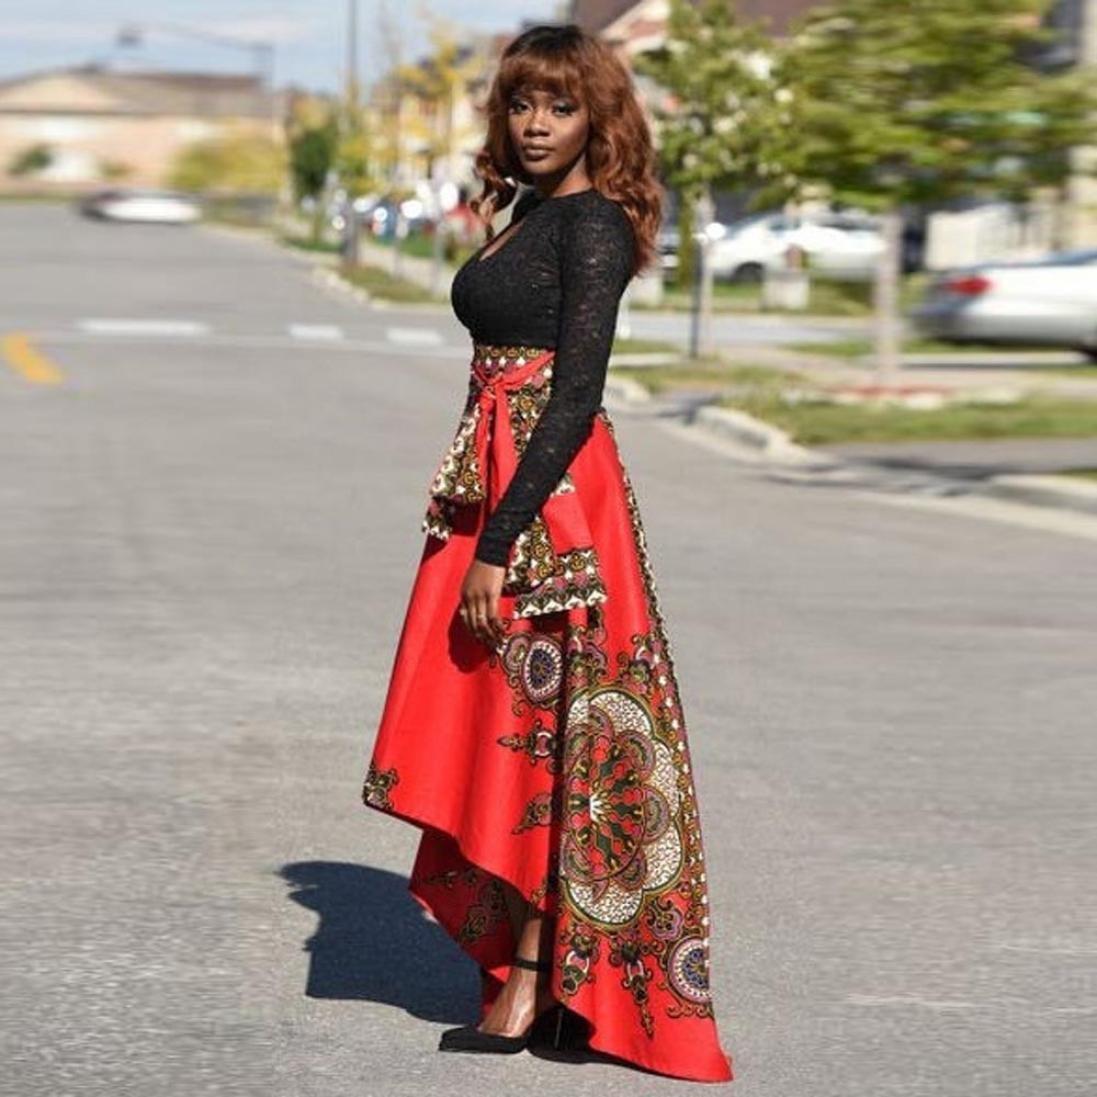 9b7b7a27ff iTLOTL New African Women Printed Summer Boho Long Dress Beach Evening Party Maxi  Skirt at Amazon Women's Clothing store: